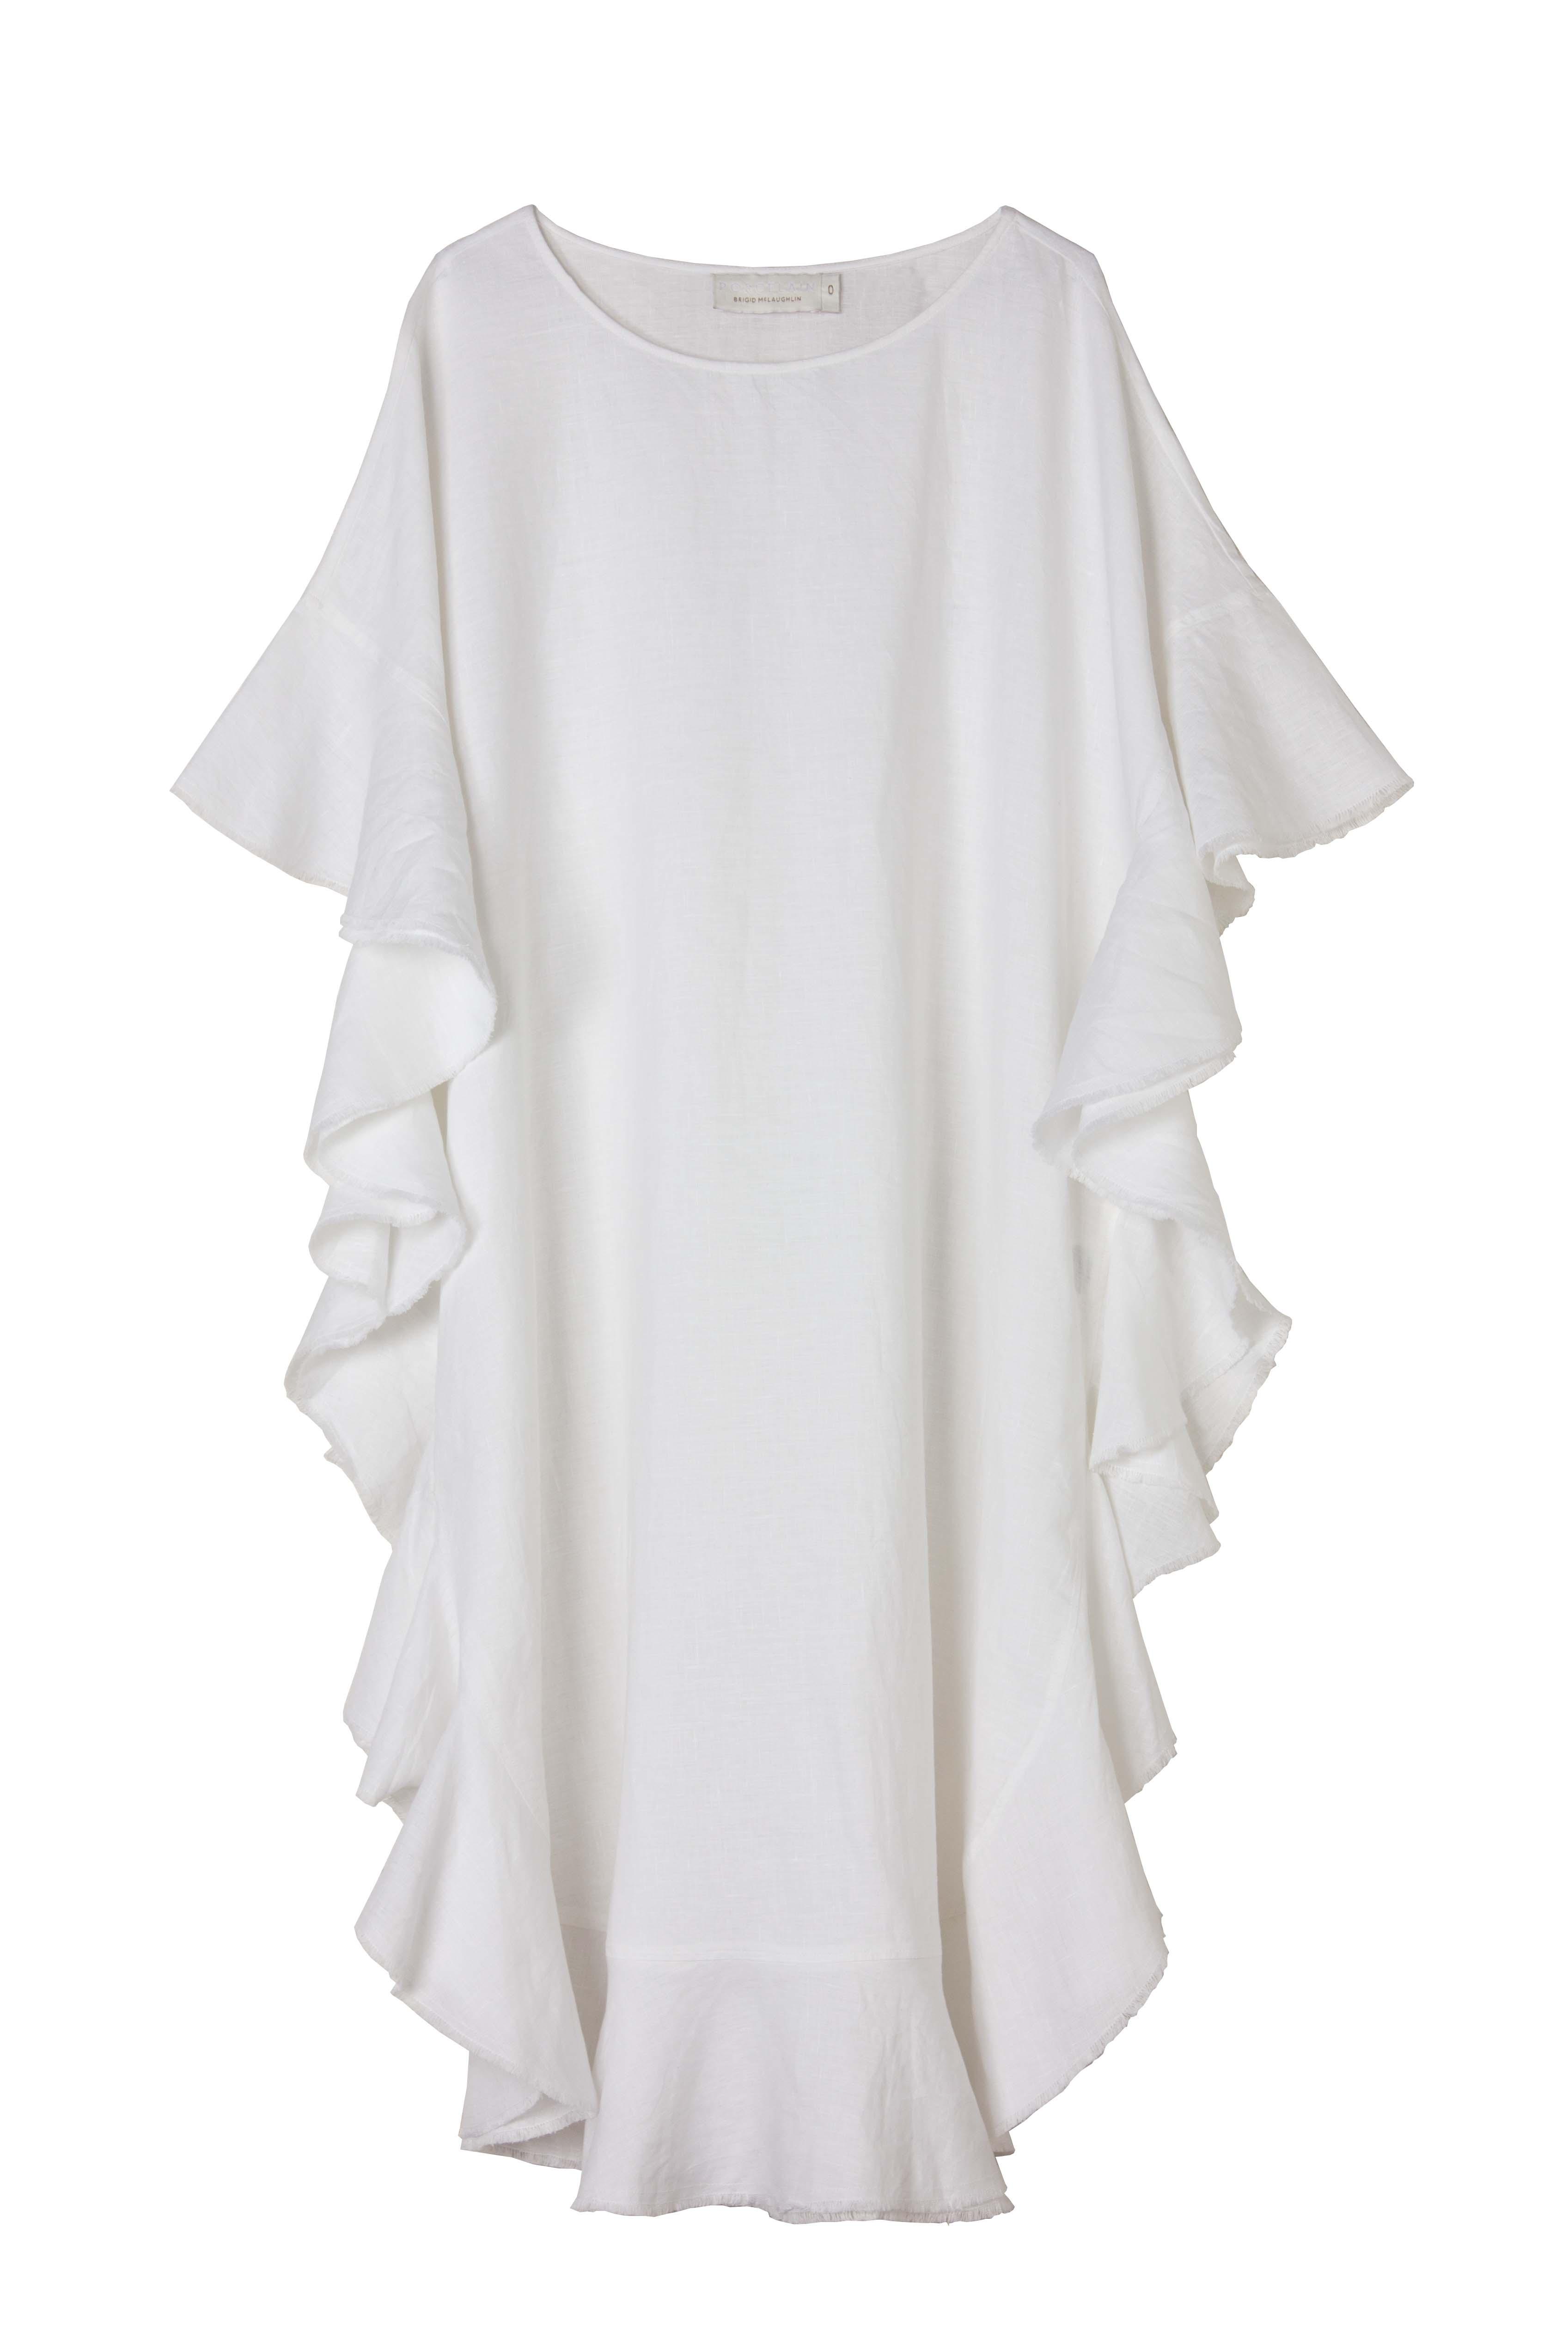 245fcfef12 Dresses - Brigid McLaughlin Pty Ltd